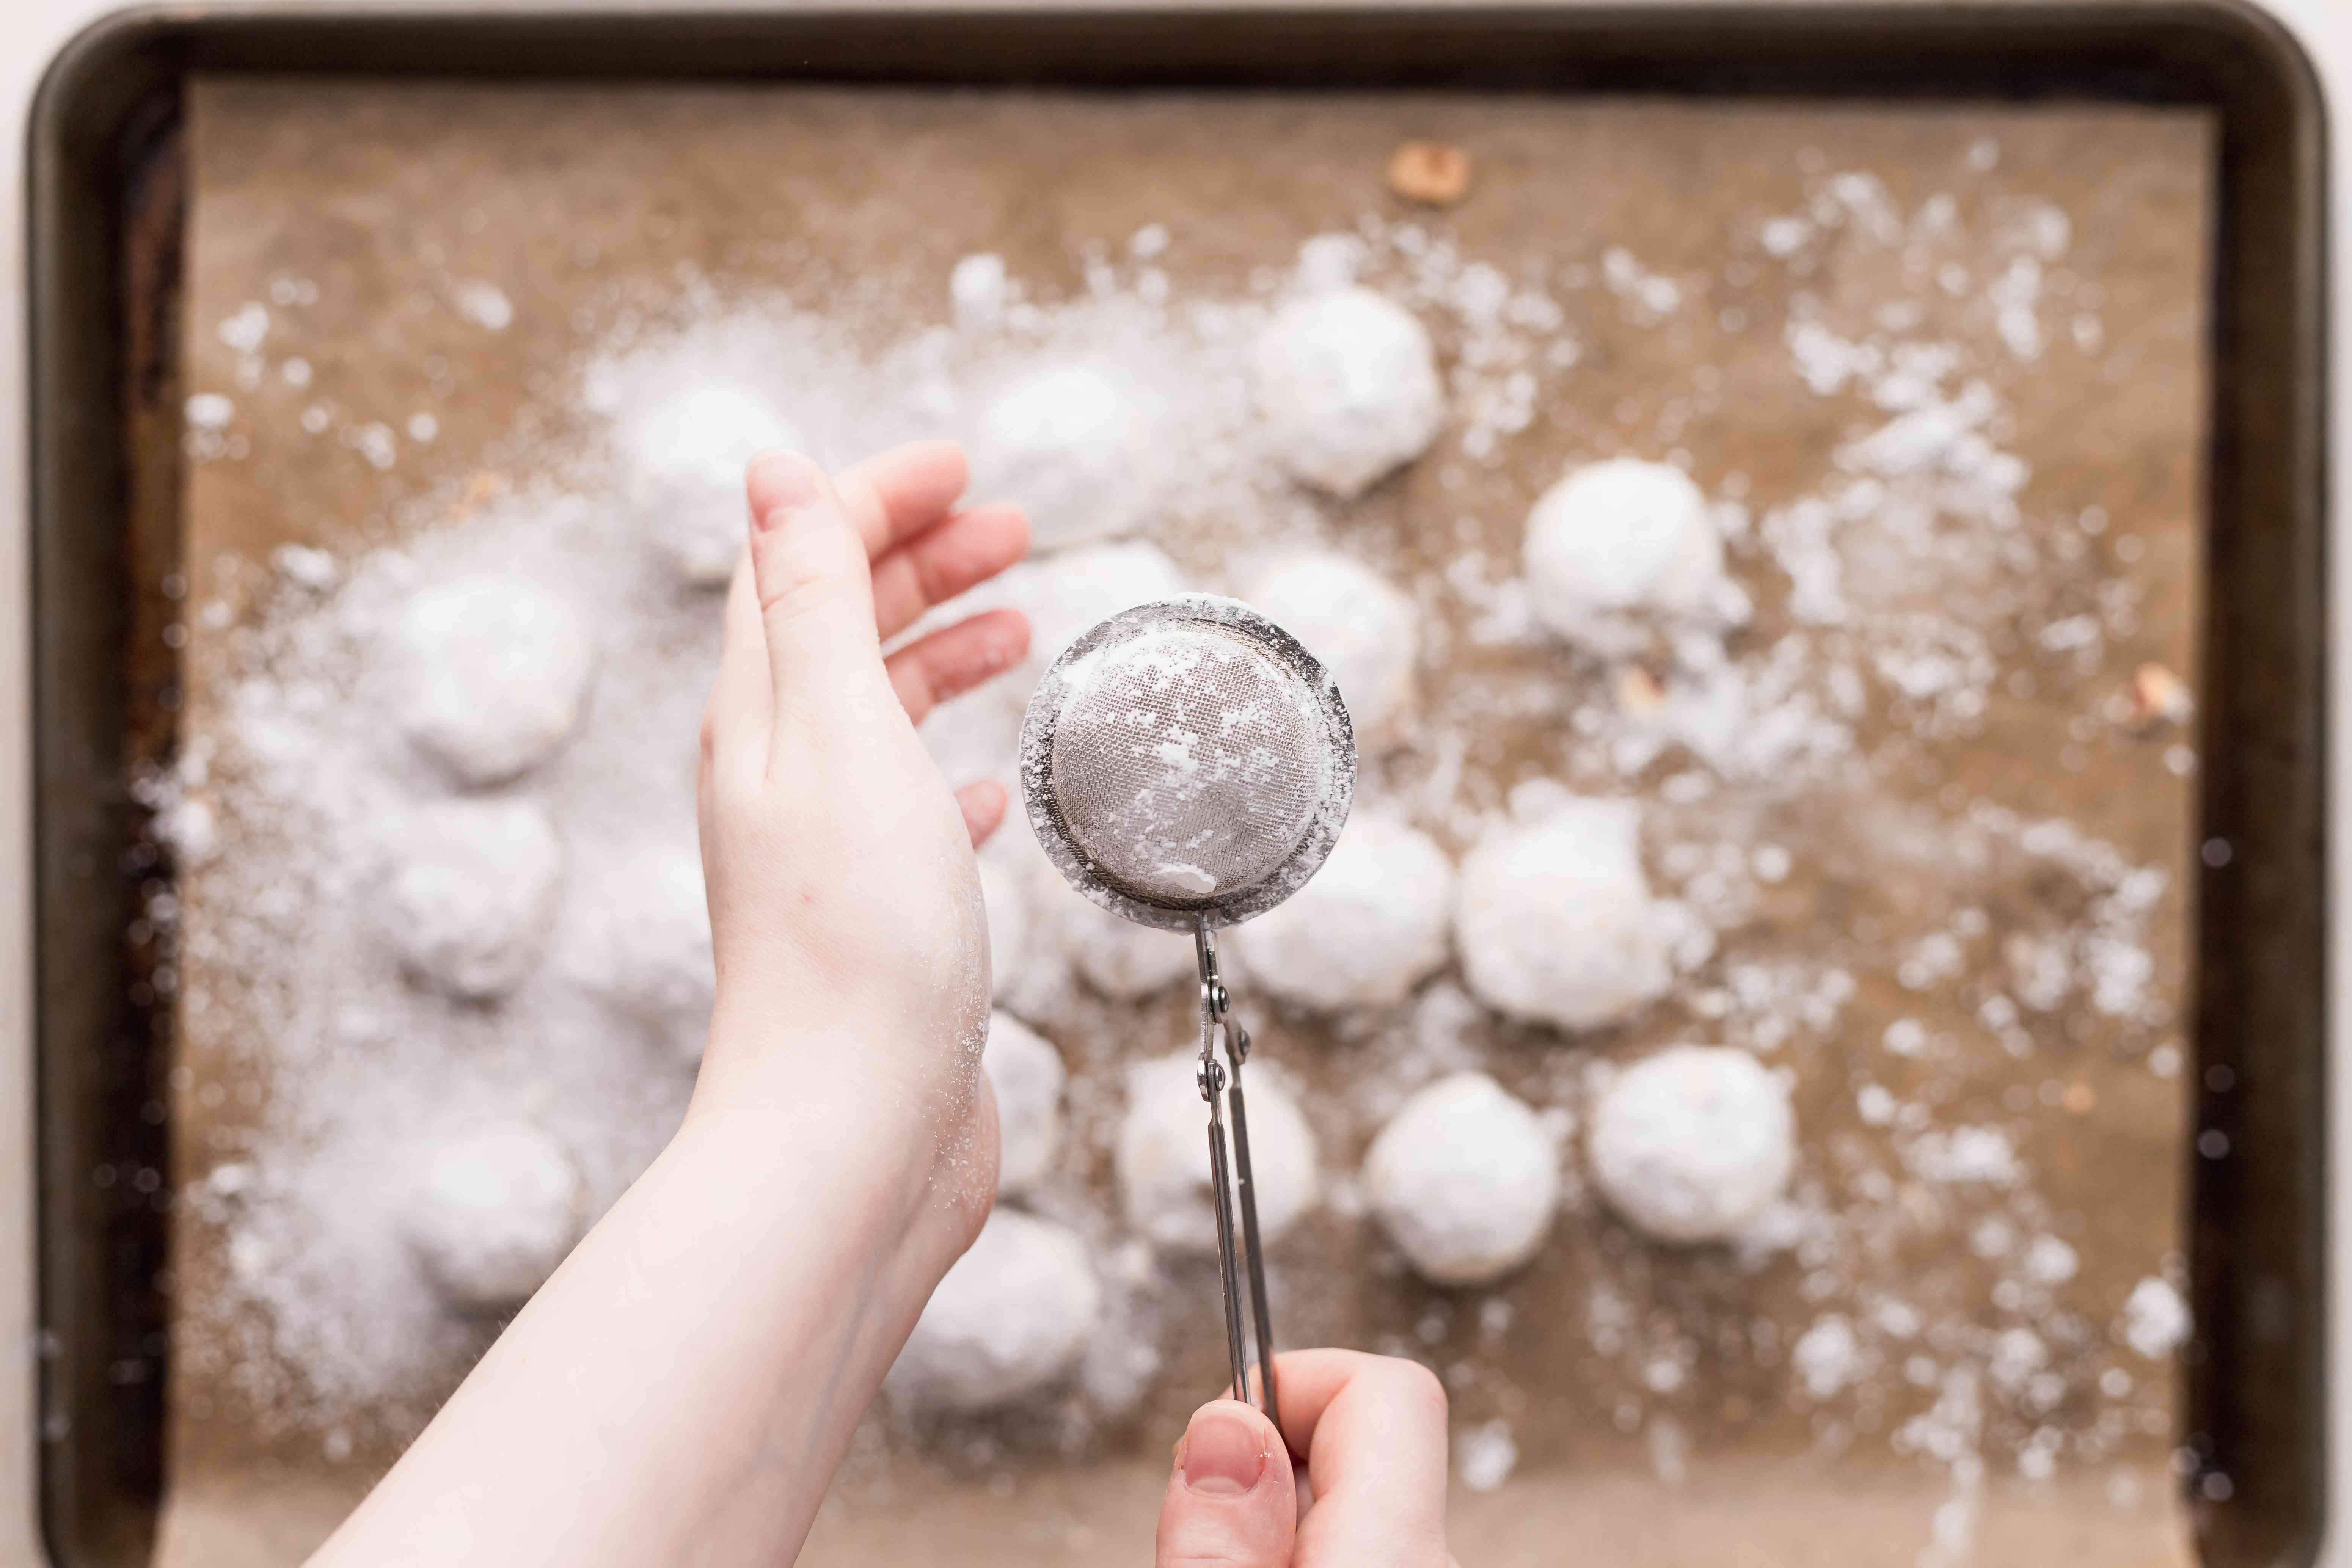 Dusting powdered sugar cookies with powdered sugar.